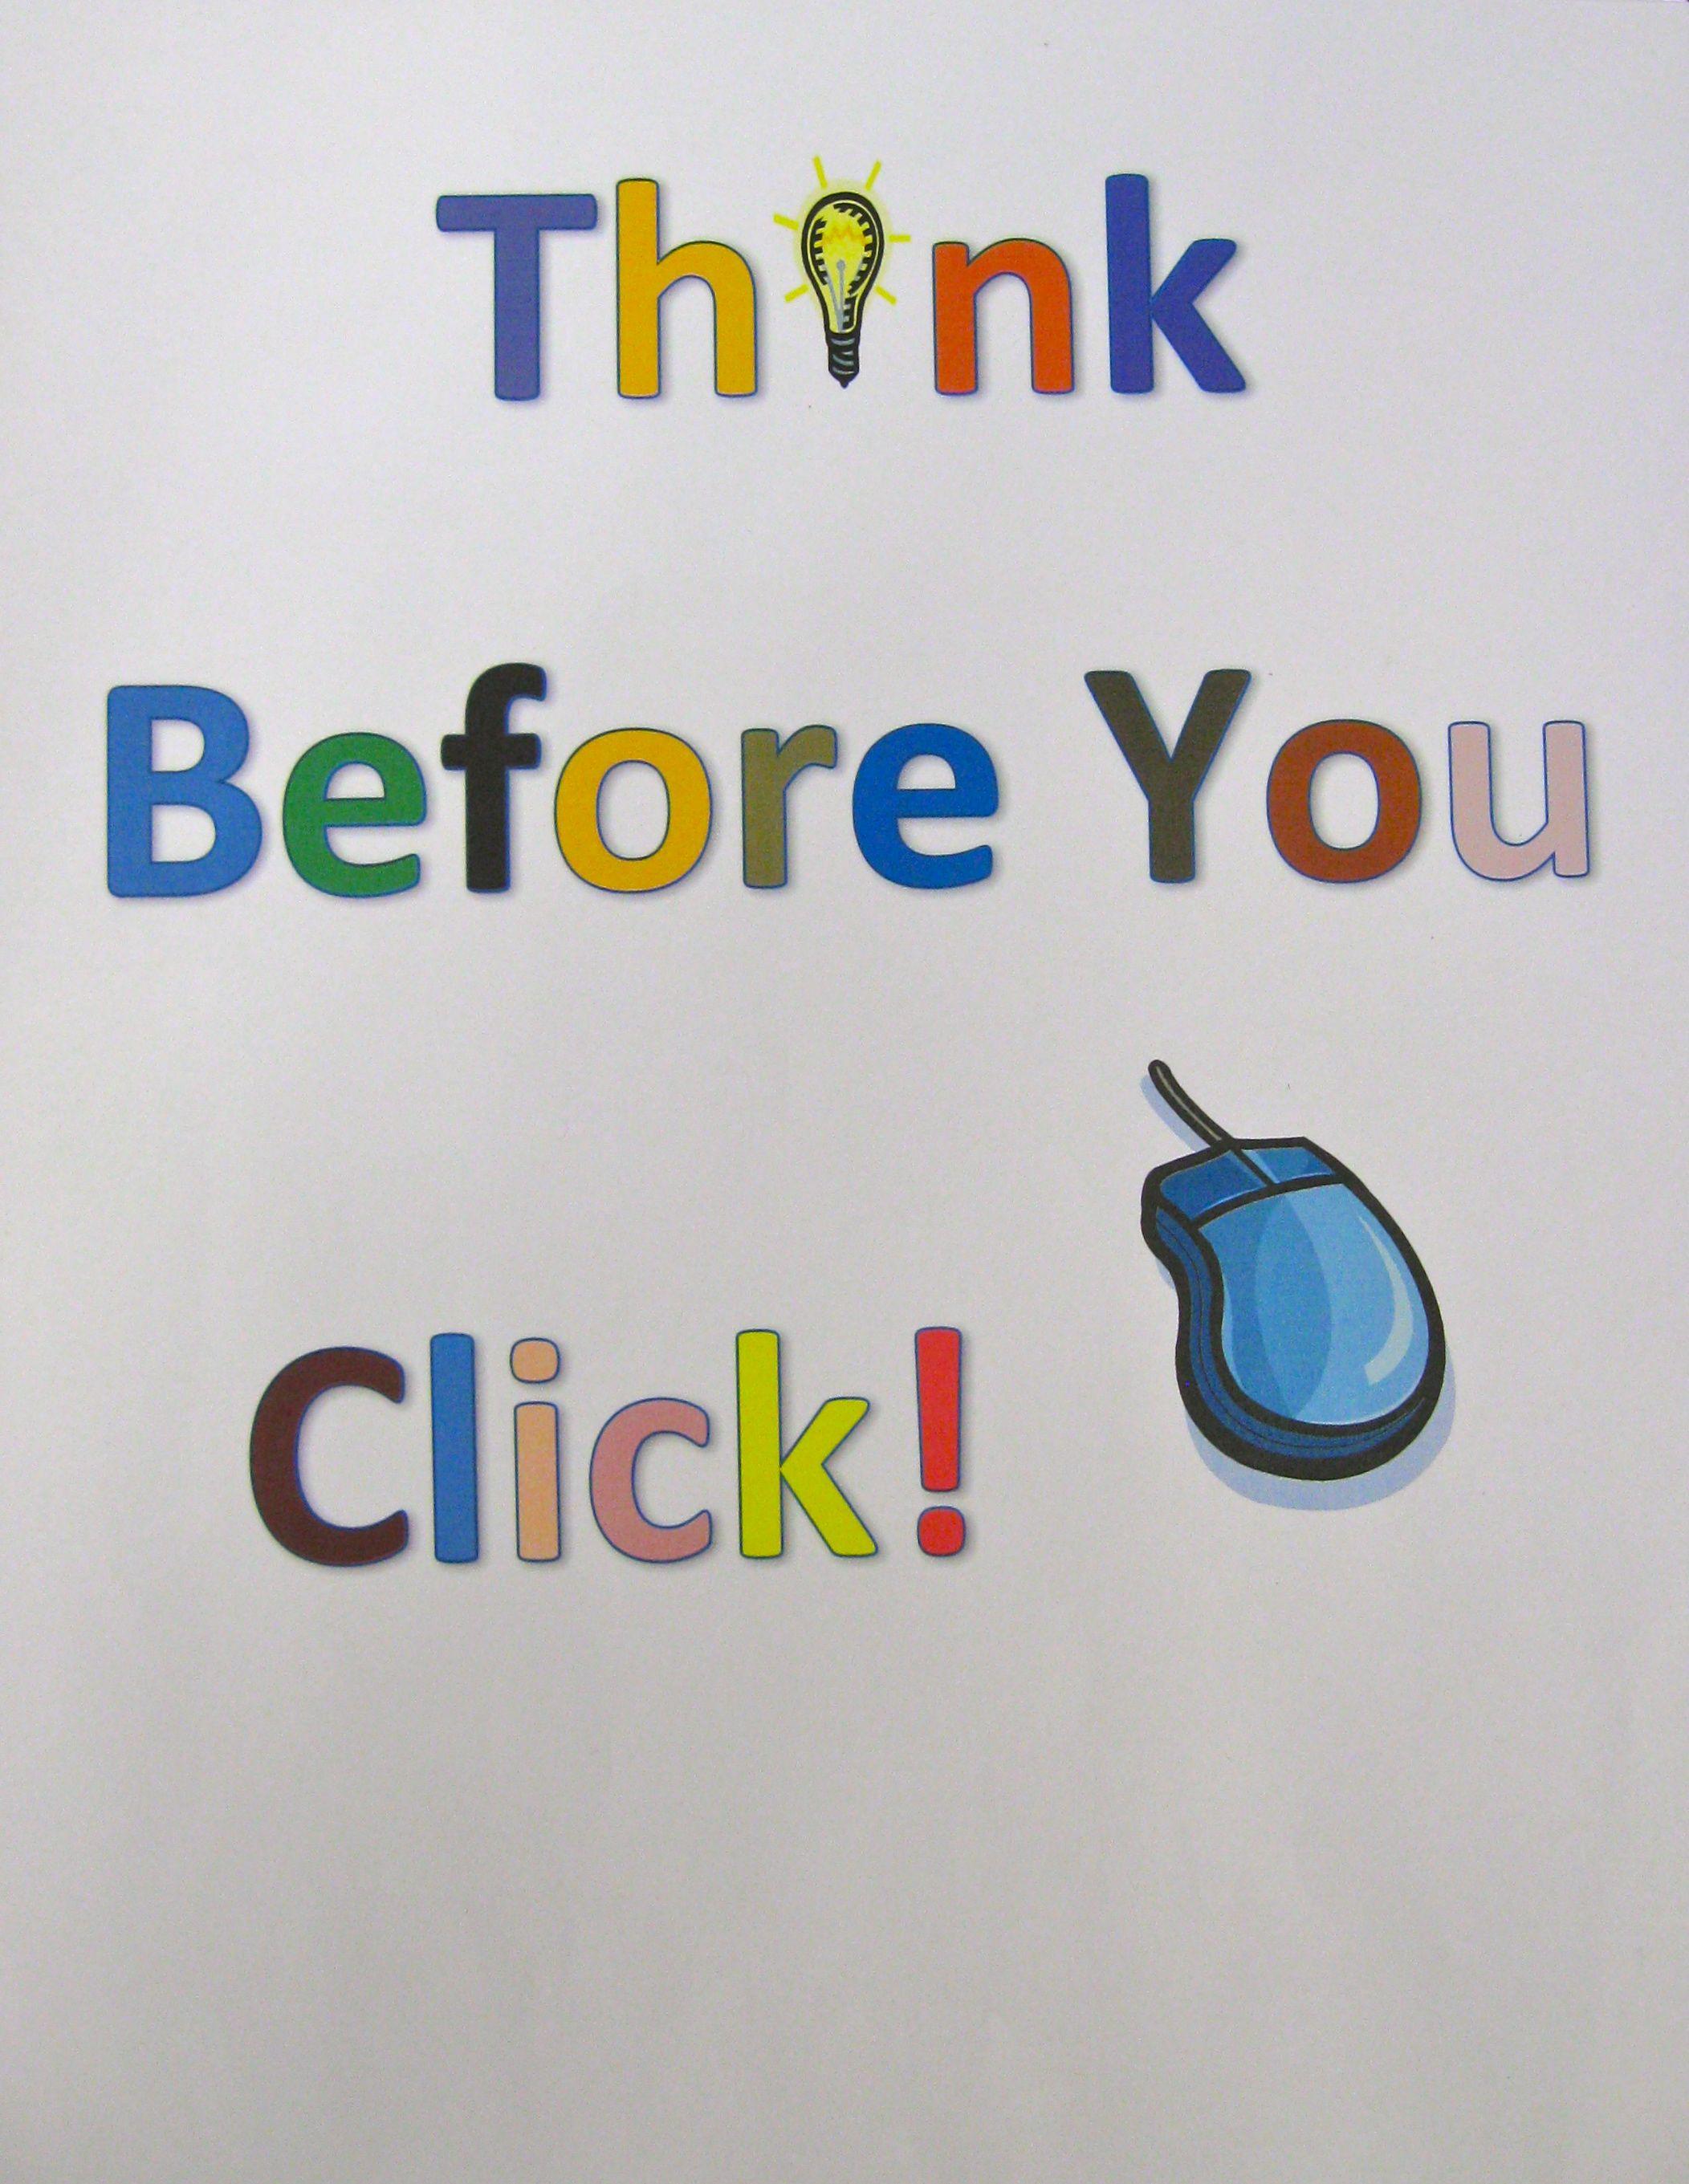 E safety poster designs - Internet Safety